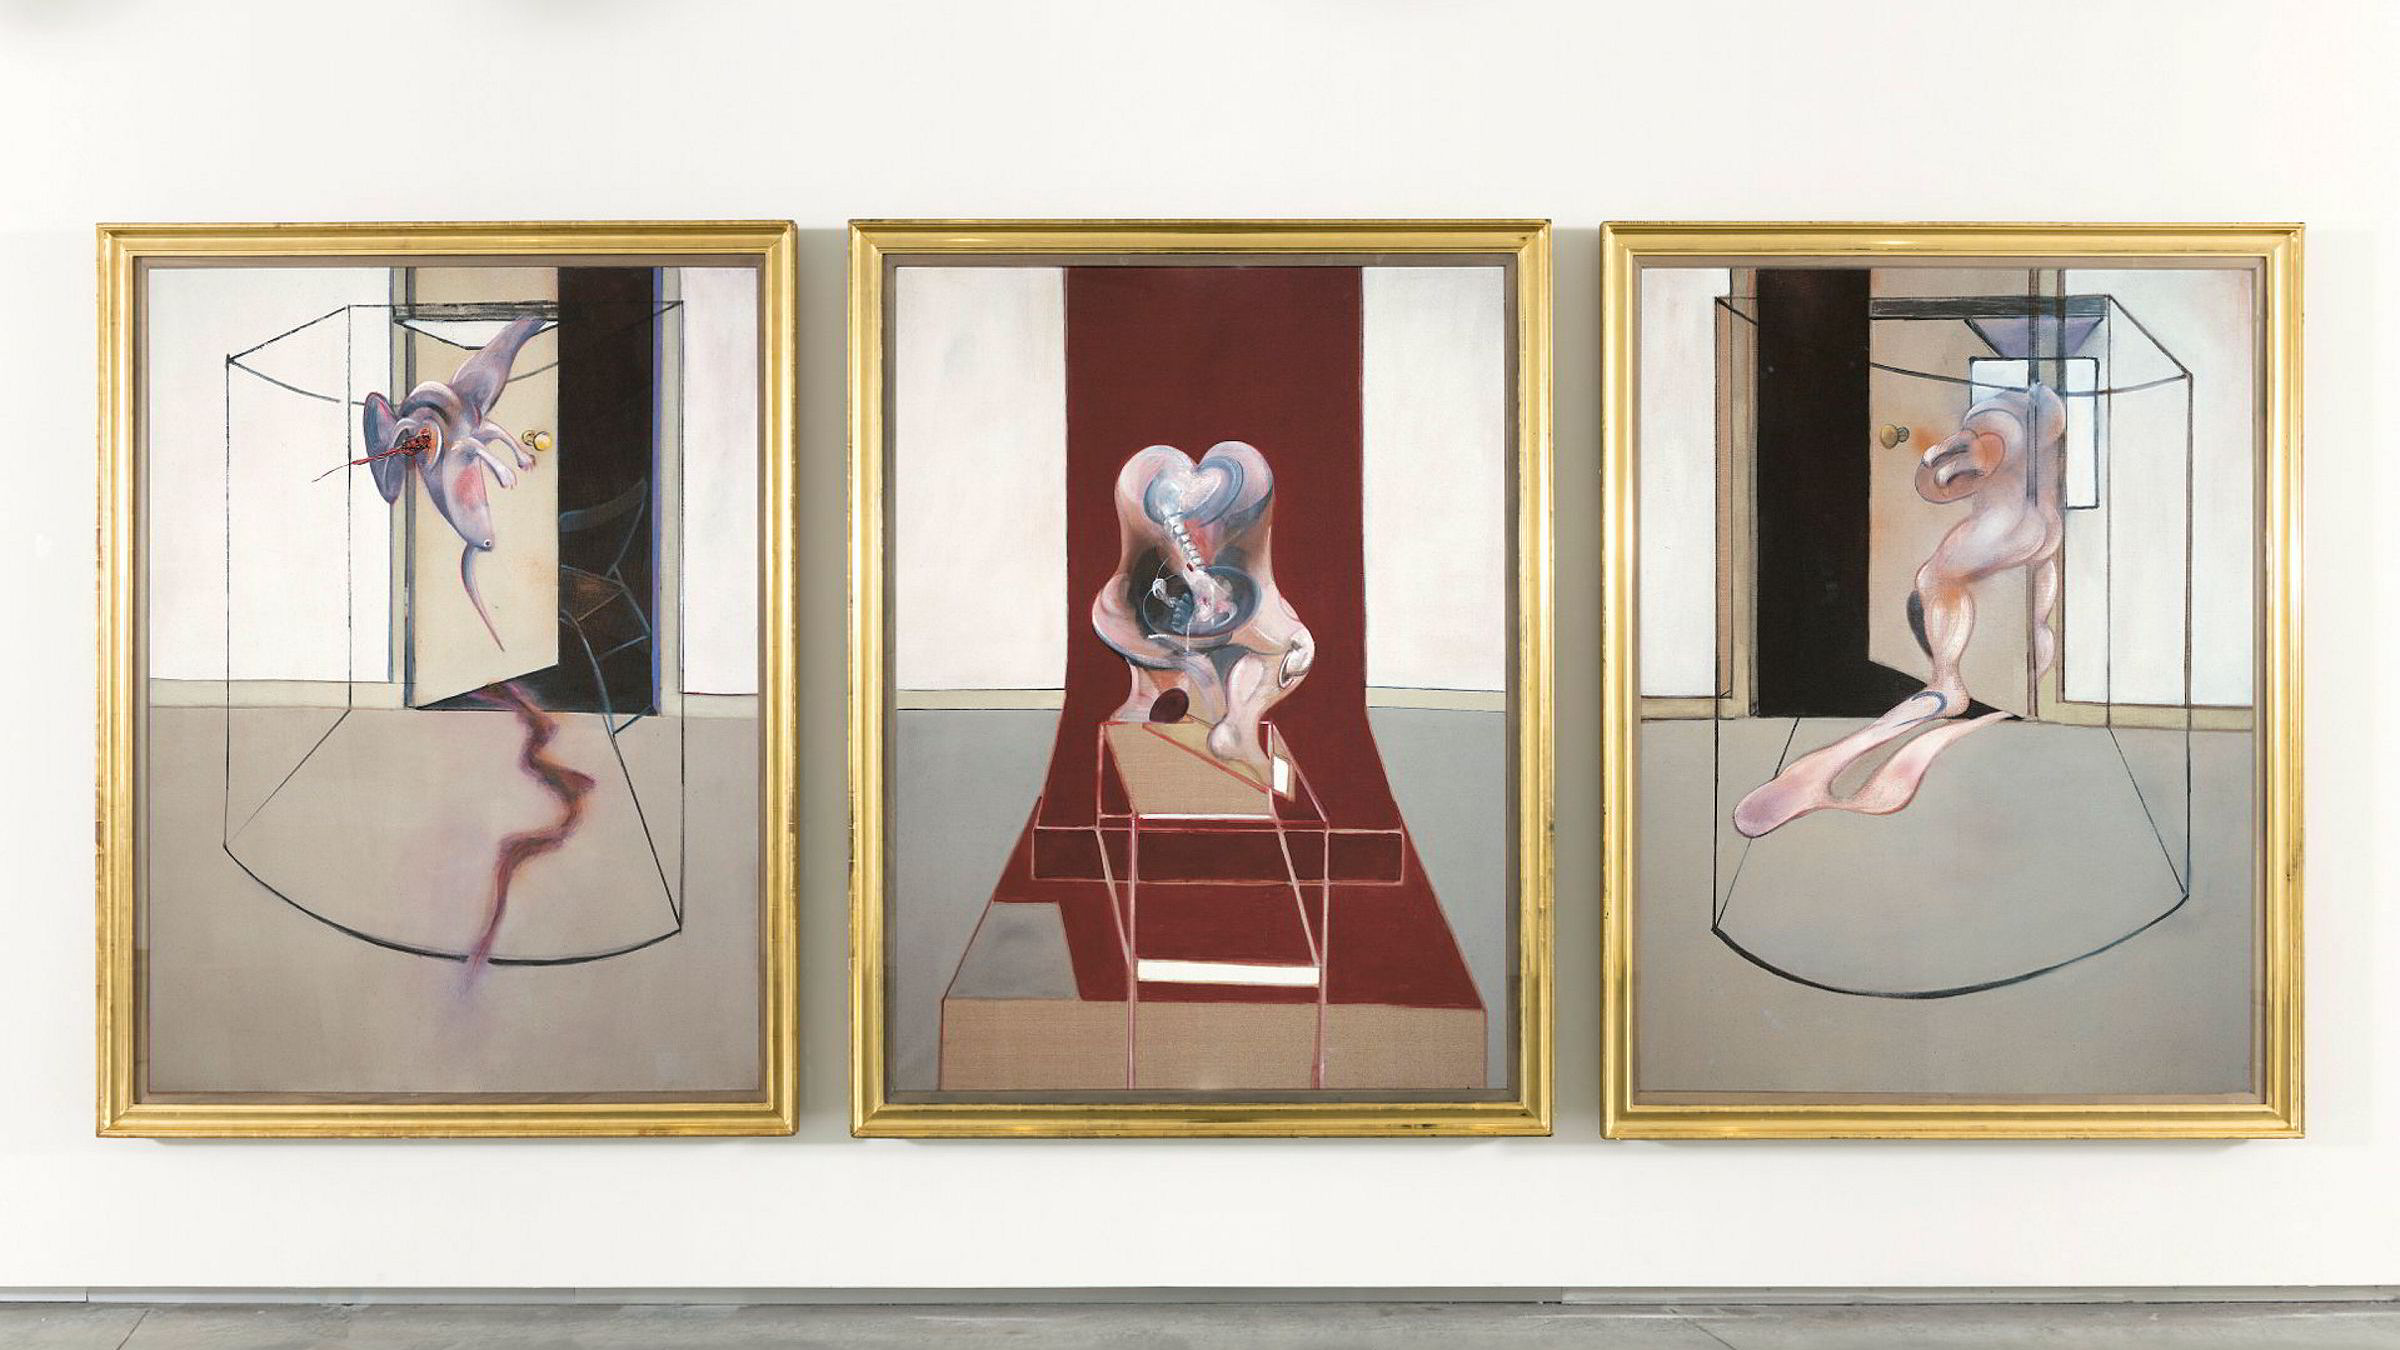 Francis Bacon, Triptych Inspired by the Oresteia of Aeschylus, 1981, eid av Astrup Fearnley.